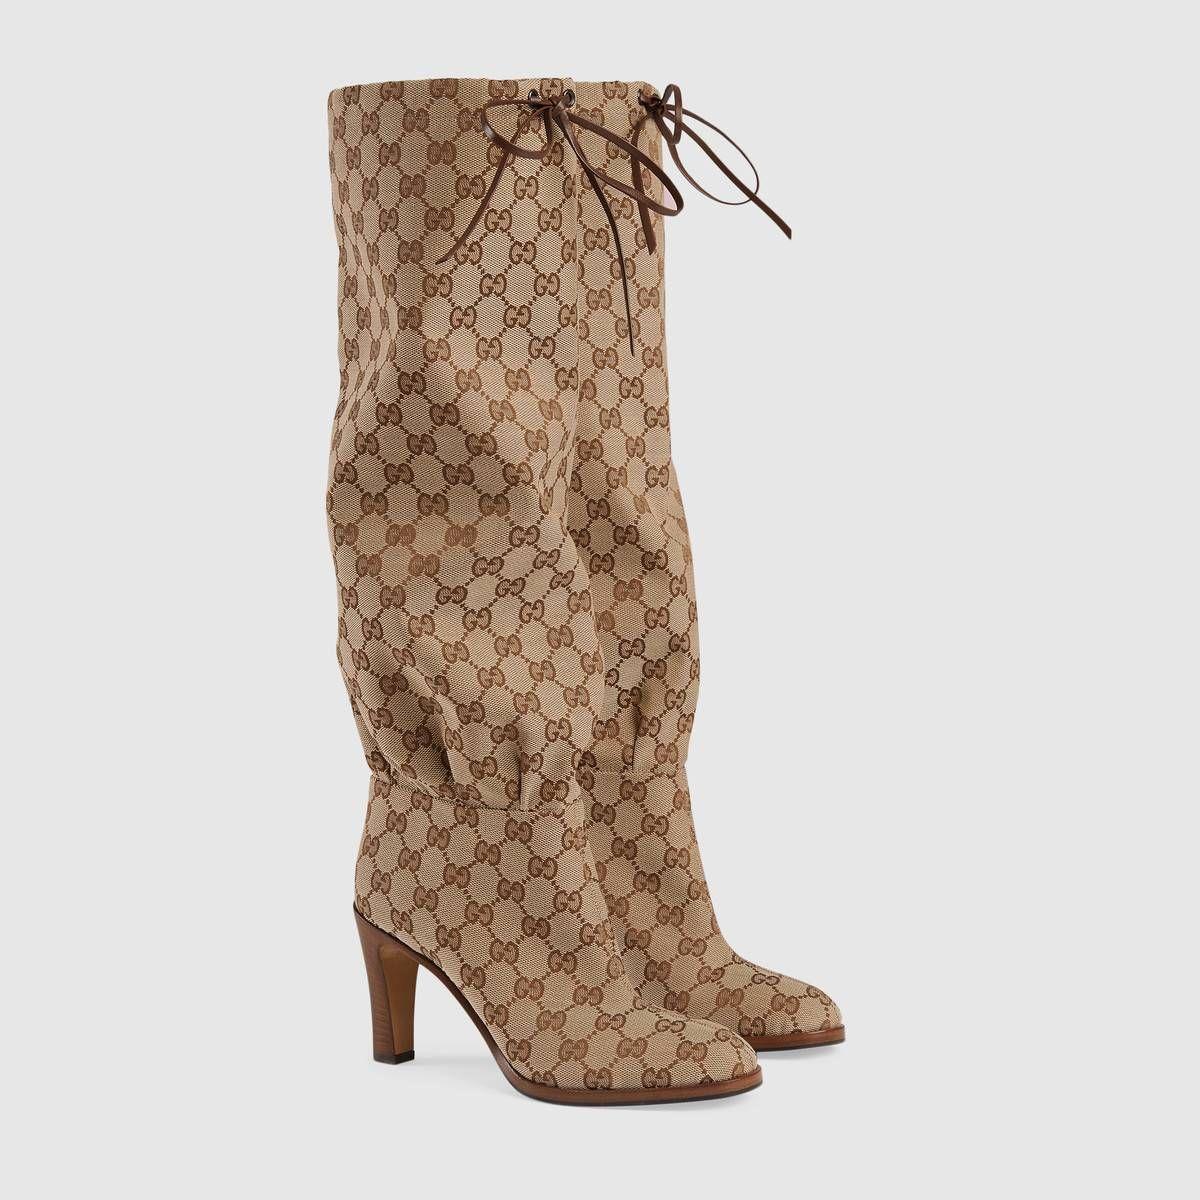 44b7c913286 GG canvas mid-heel boot in Beige and ebony GG Original canvas